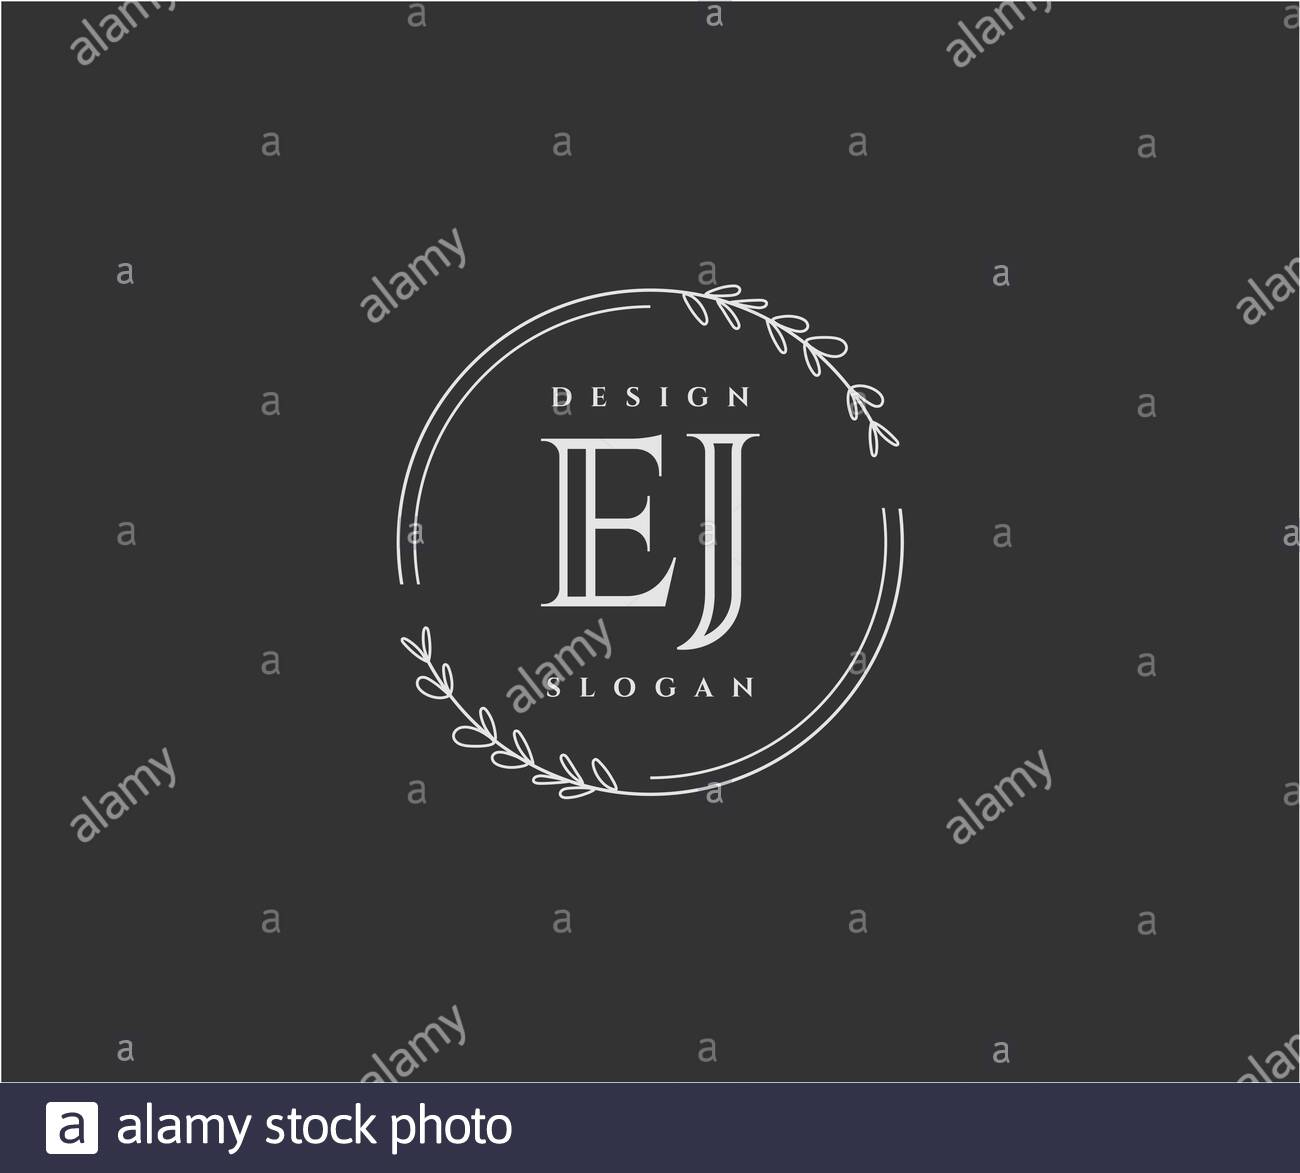 Initial Ej Beauty Monogram And Elegant Logo Design Stock Vector Image Art Alamy